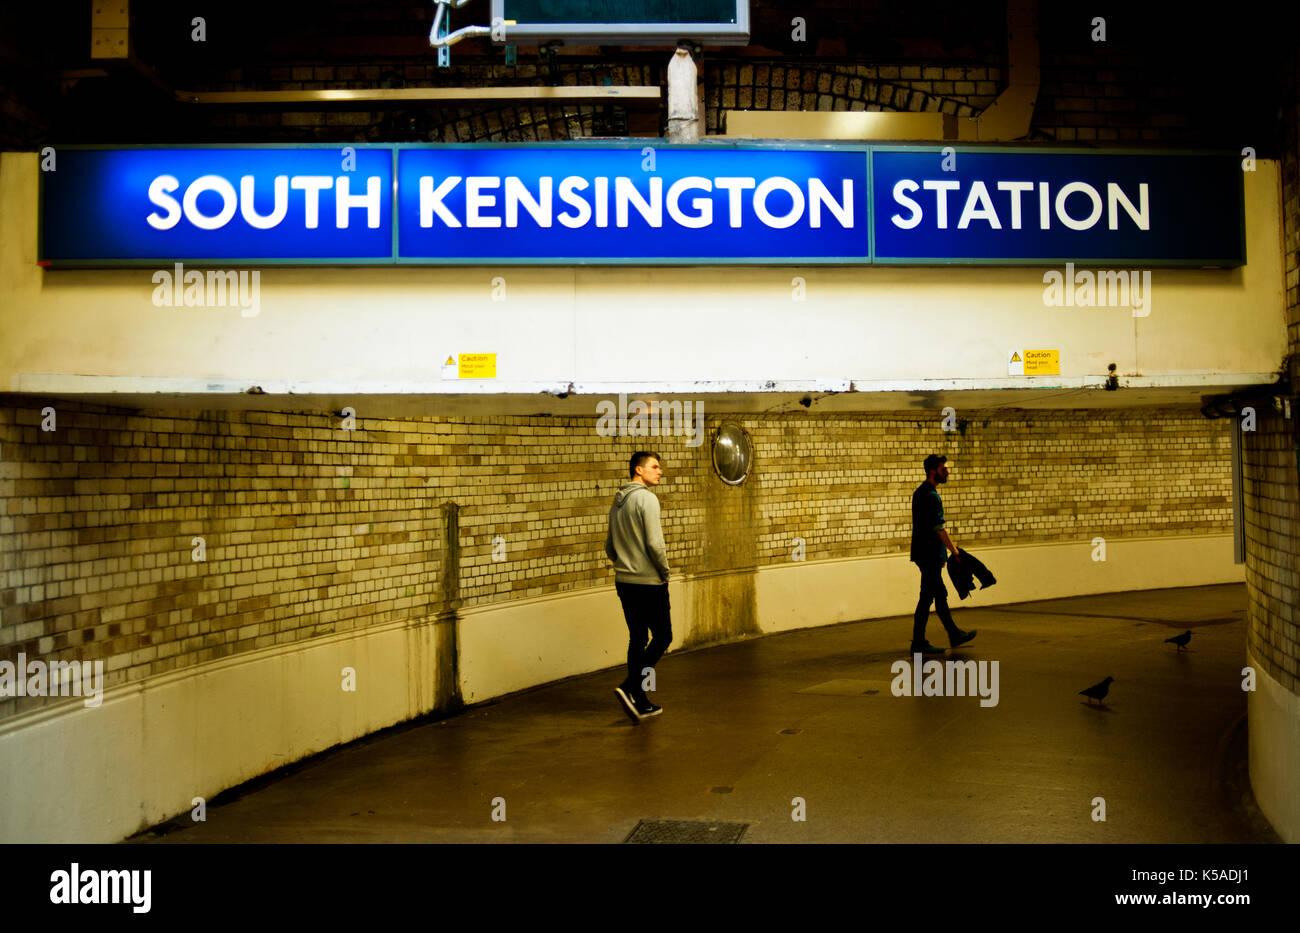 South Kensington underground railway subway, London - Stock Image